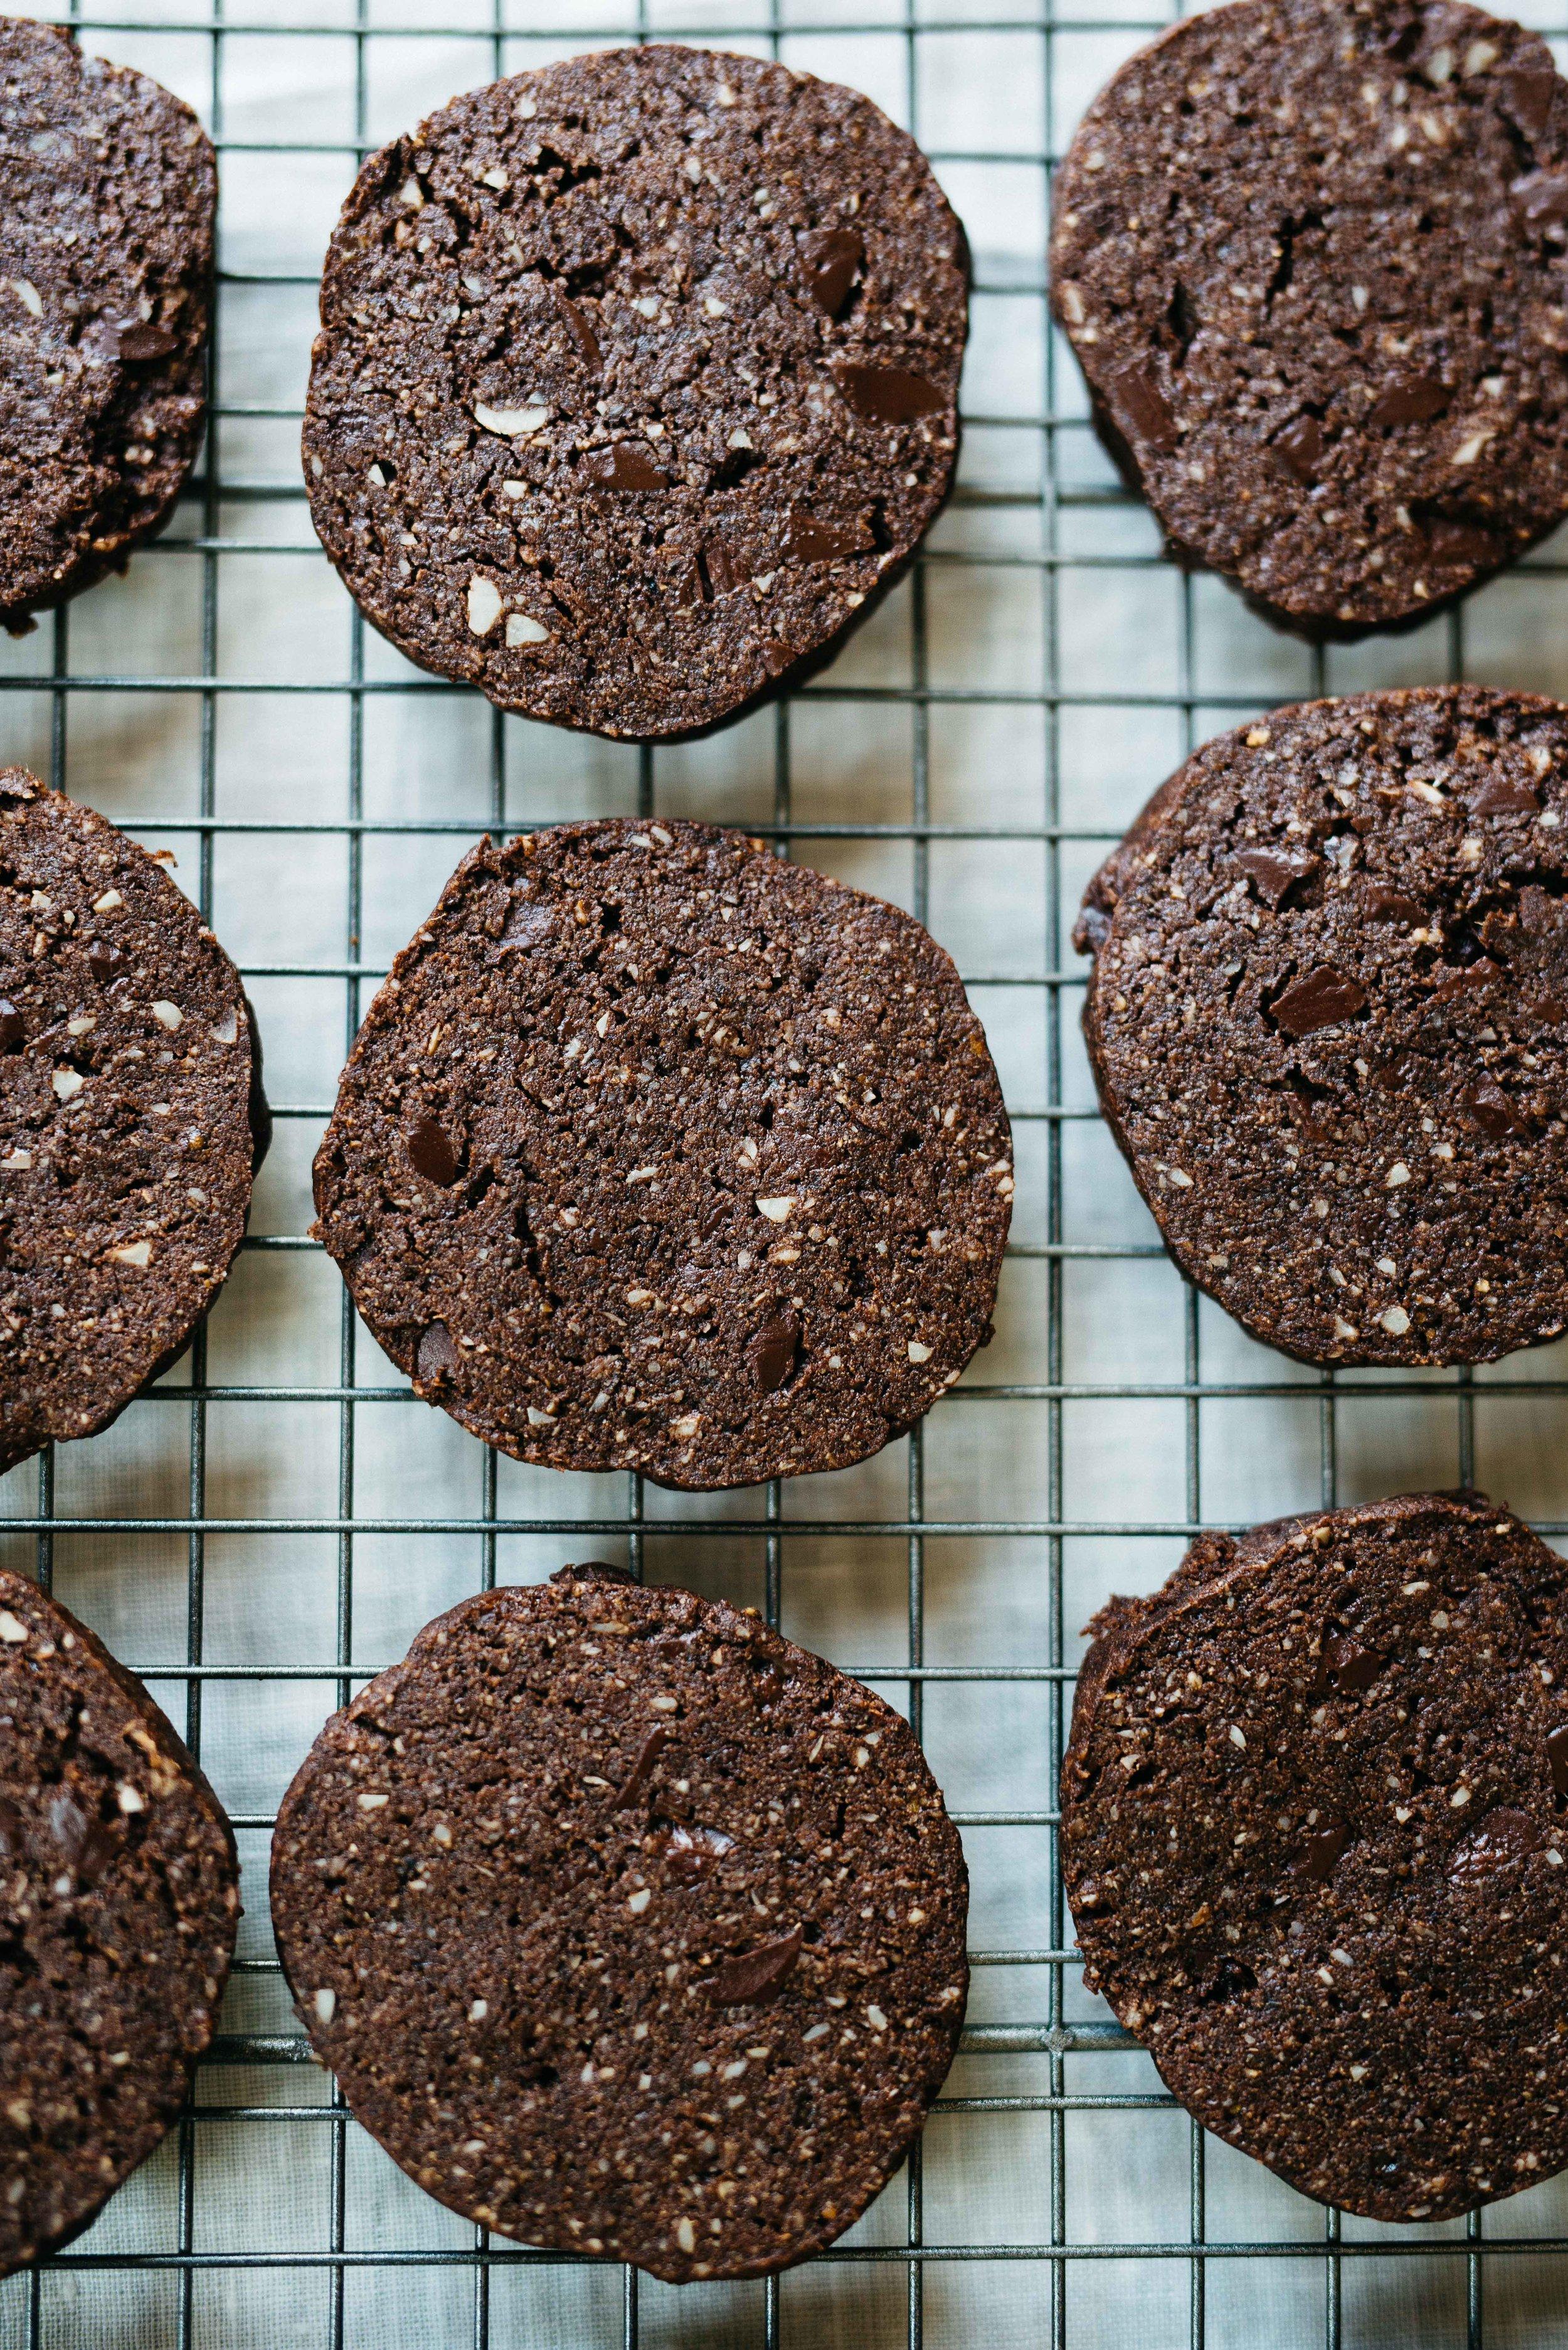 Chocolate Freeze 'N' Slice Cookies & Coconut Caramel Sundaes